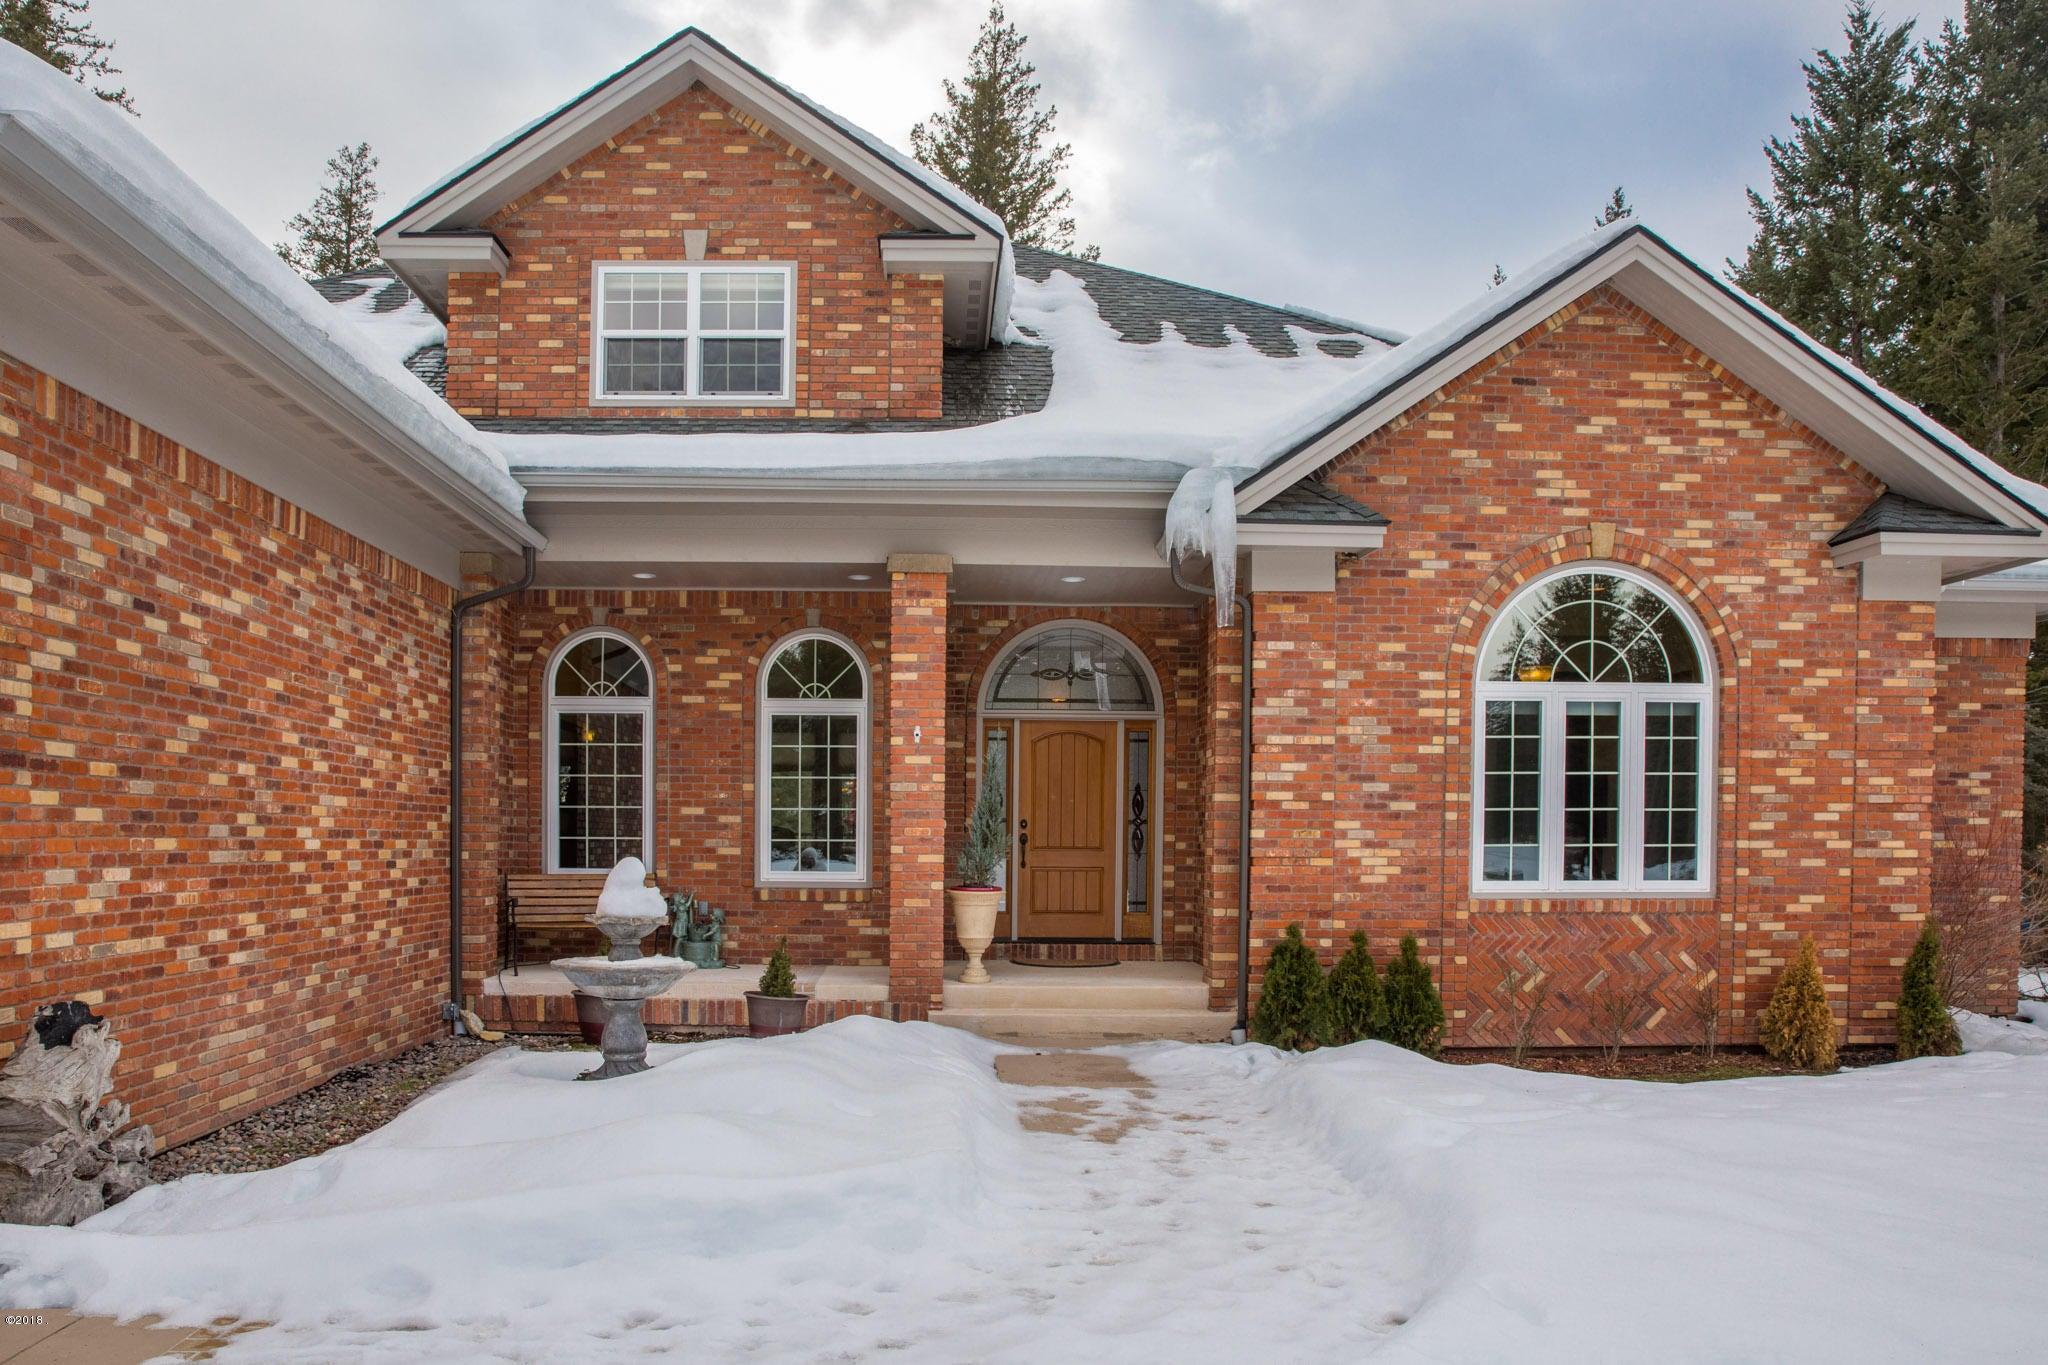 Additional photo for property listing at 30 Wood Ridge Drive 30 Wood Ridge Drive Columbia Falls, Montana 59912 United States